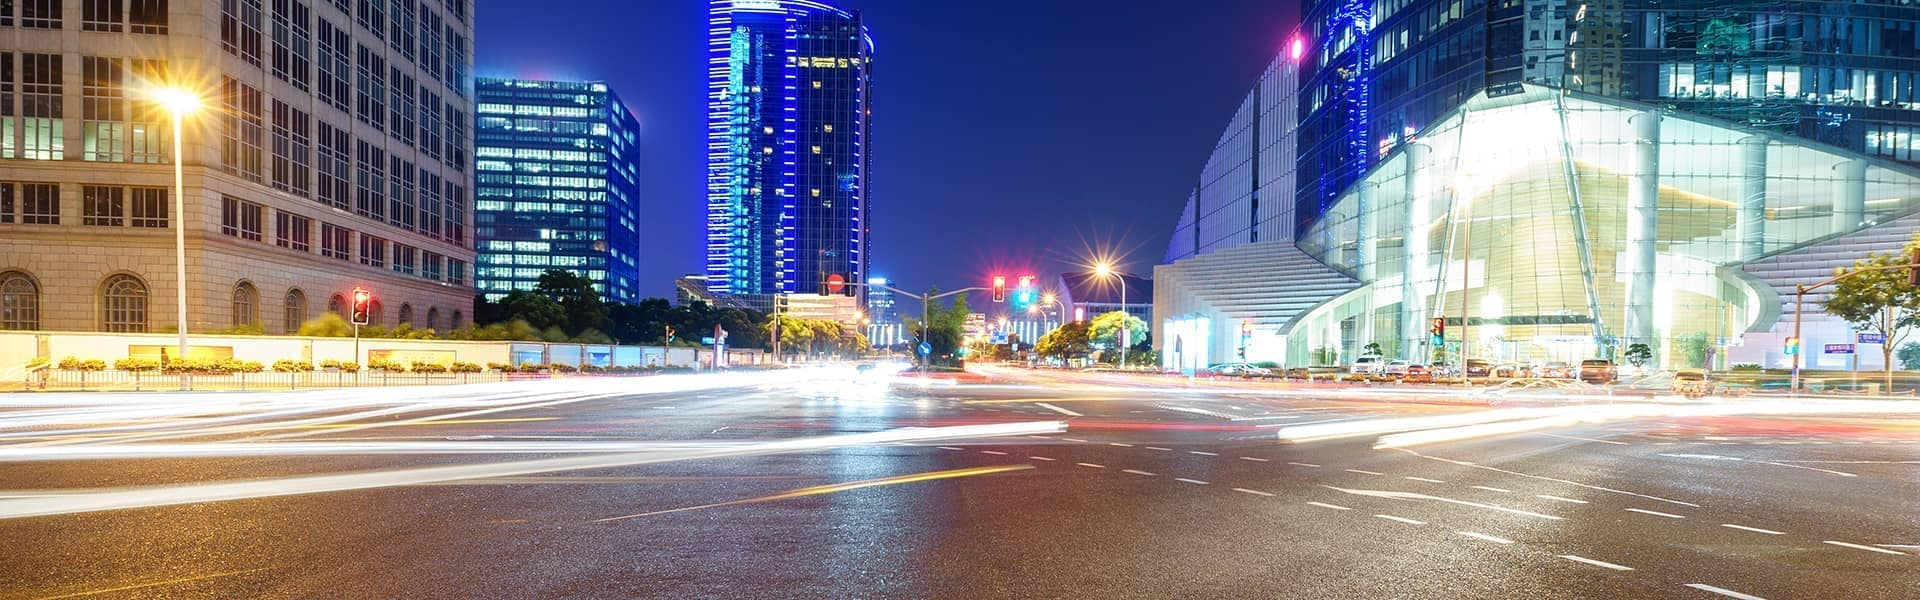 Downtown-City-Night